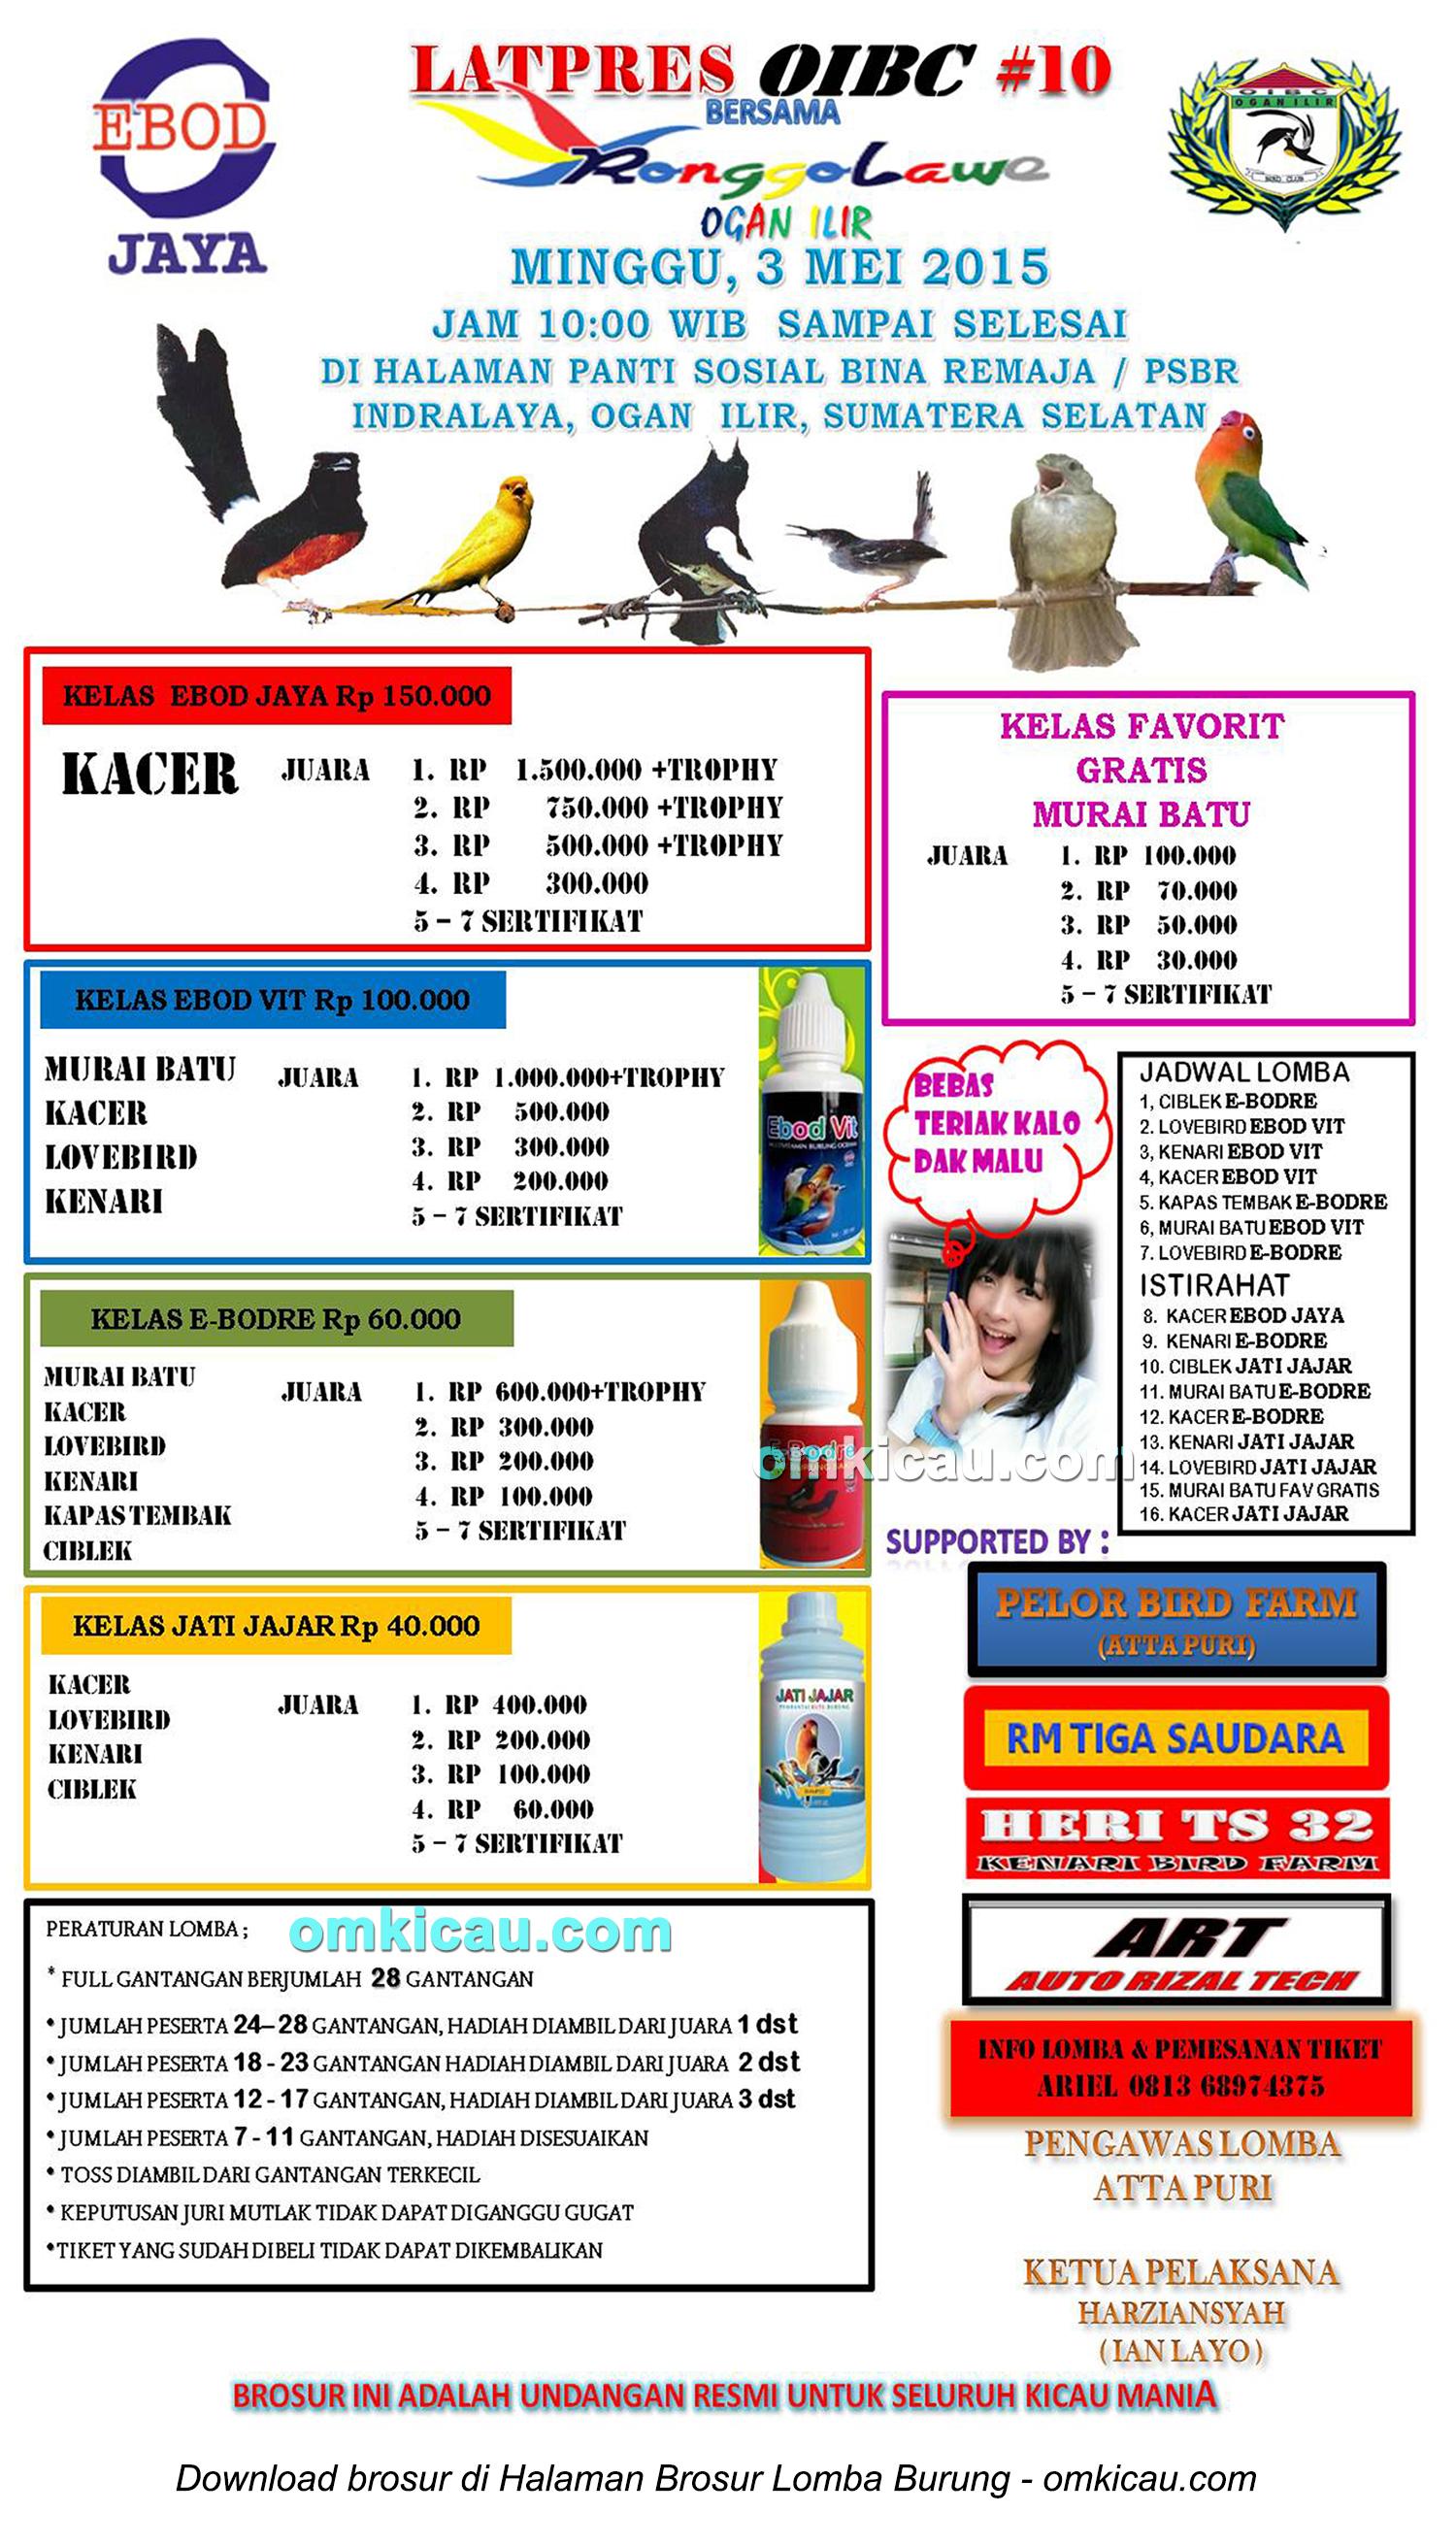 Brosur Latpres Burung Berkicau OIBC#10, Ogan Ilir, 3 Mei 2015